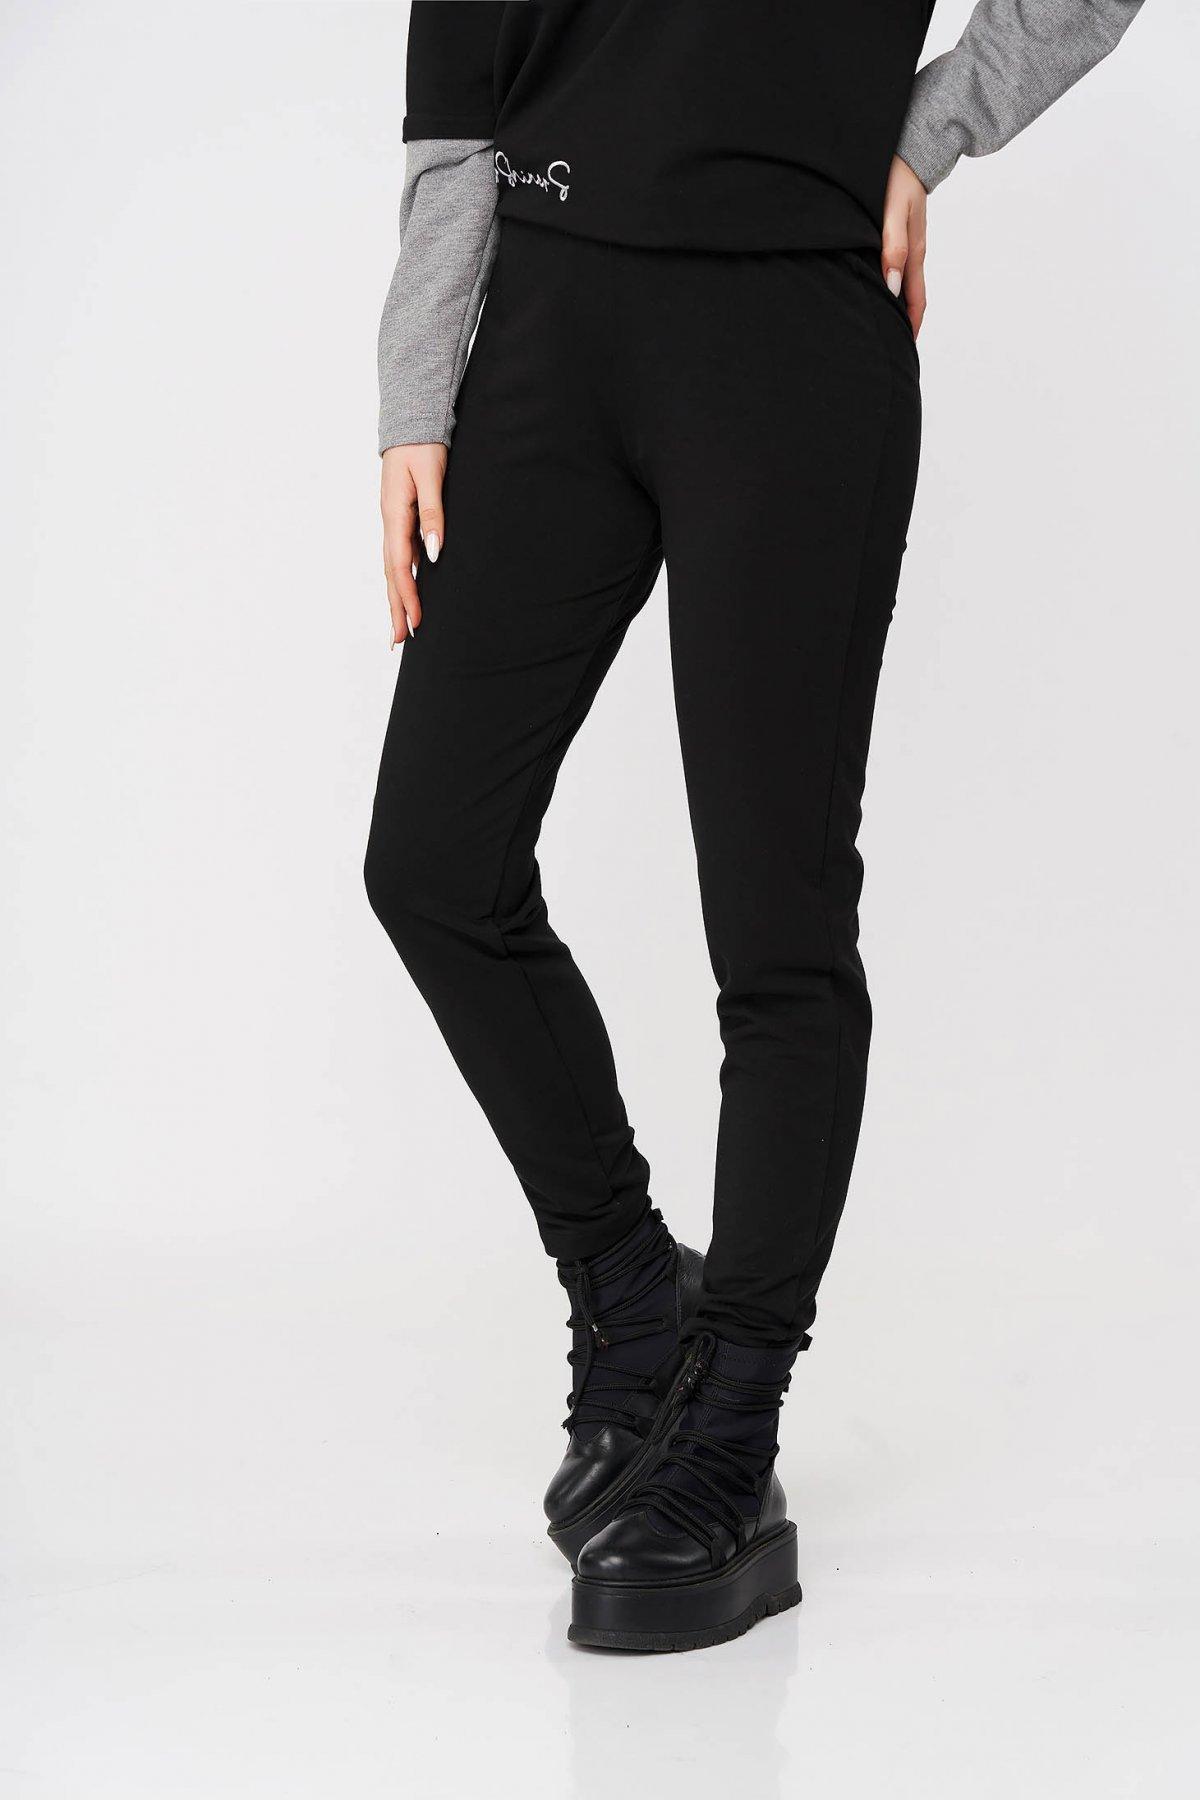 Pantaloni StarShinerS negri sport lungi conici cu elastic in talie